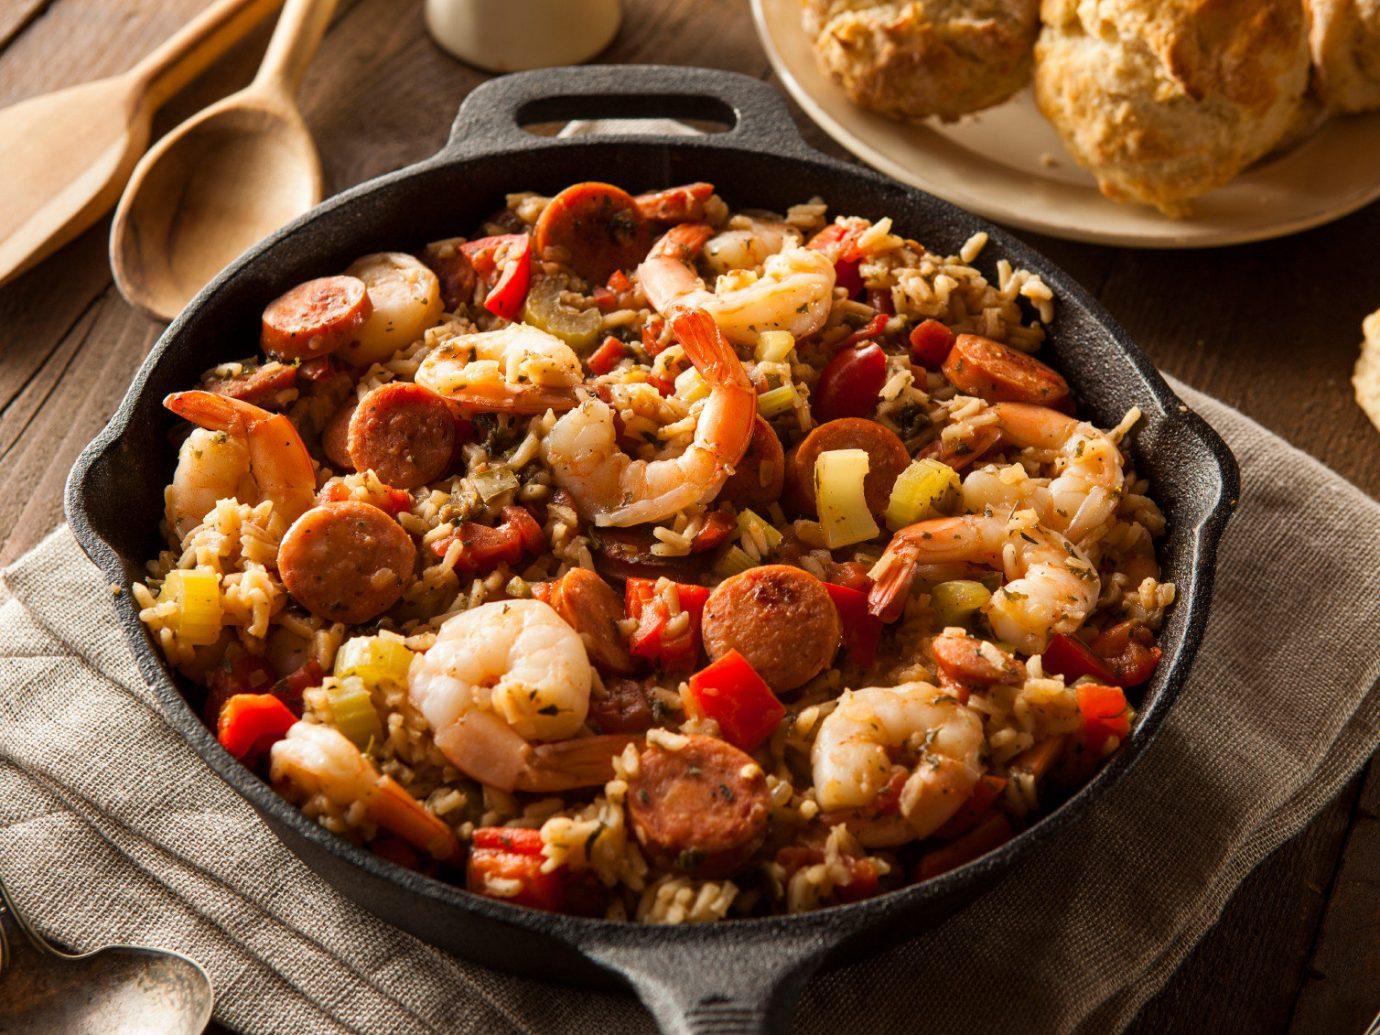 Food + Drink food dish cuisine produce meat vegetable jambalaya meal european food several